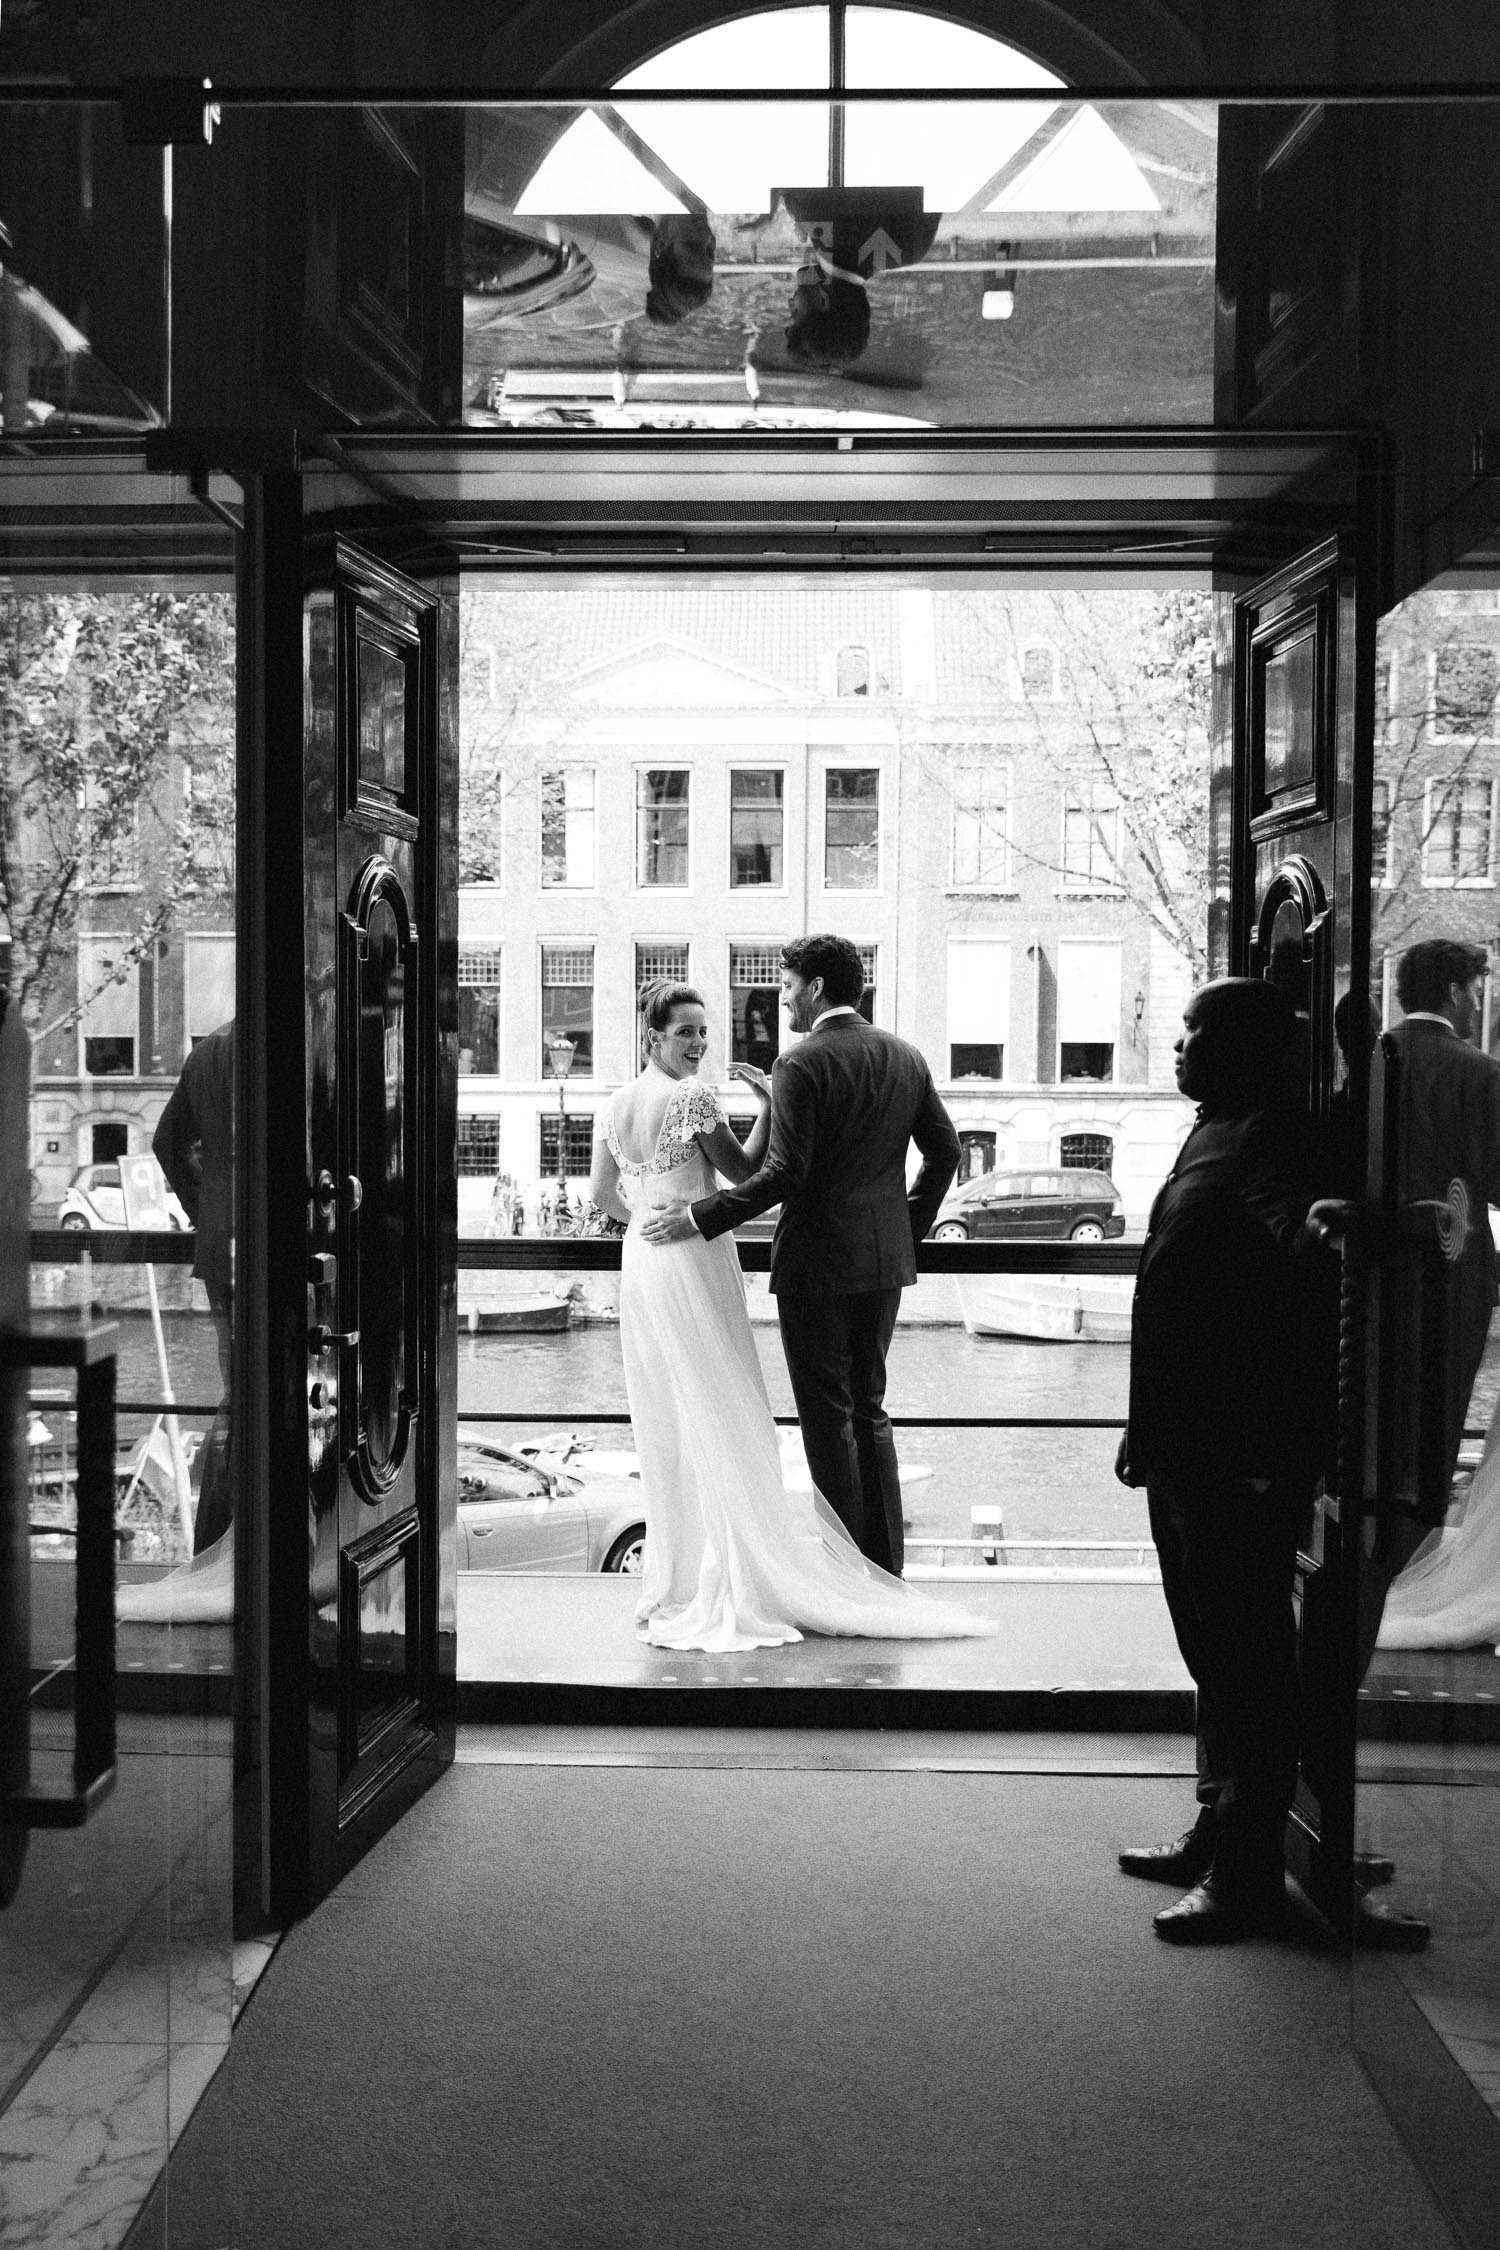 Backyard-wedding-Bruiloft-Annemiek-David-fotografie-photography-On-a-hazy-morning-Amsterdam-The-Netherlands097.jpg